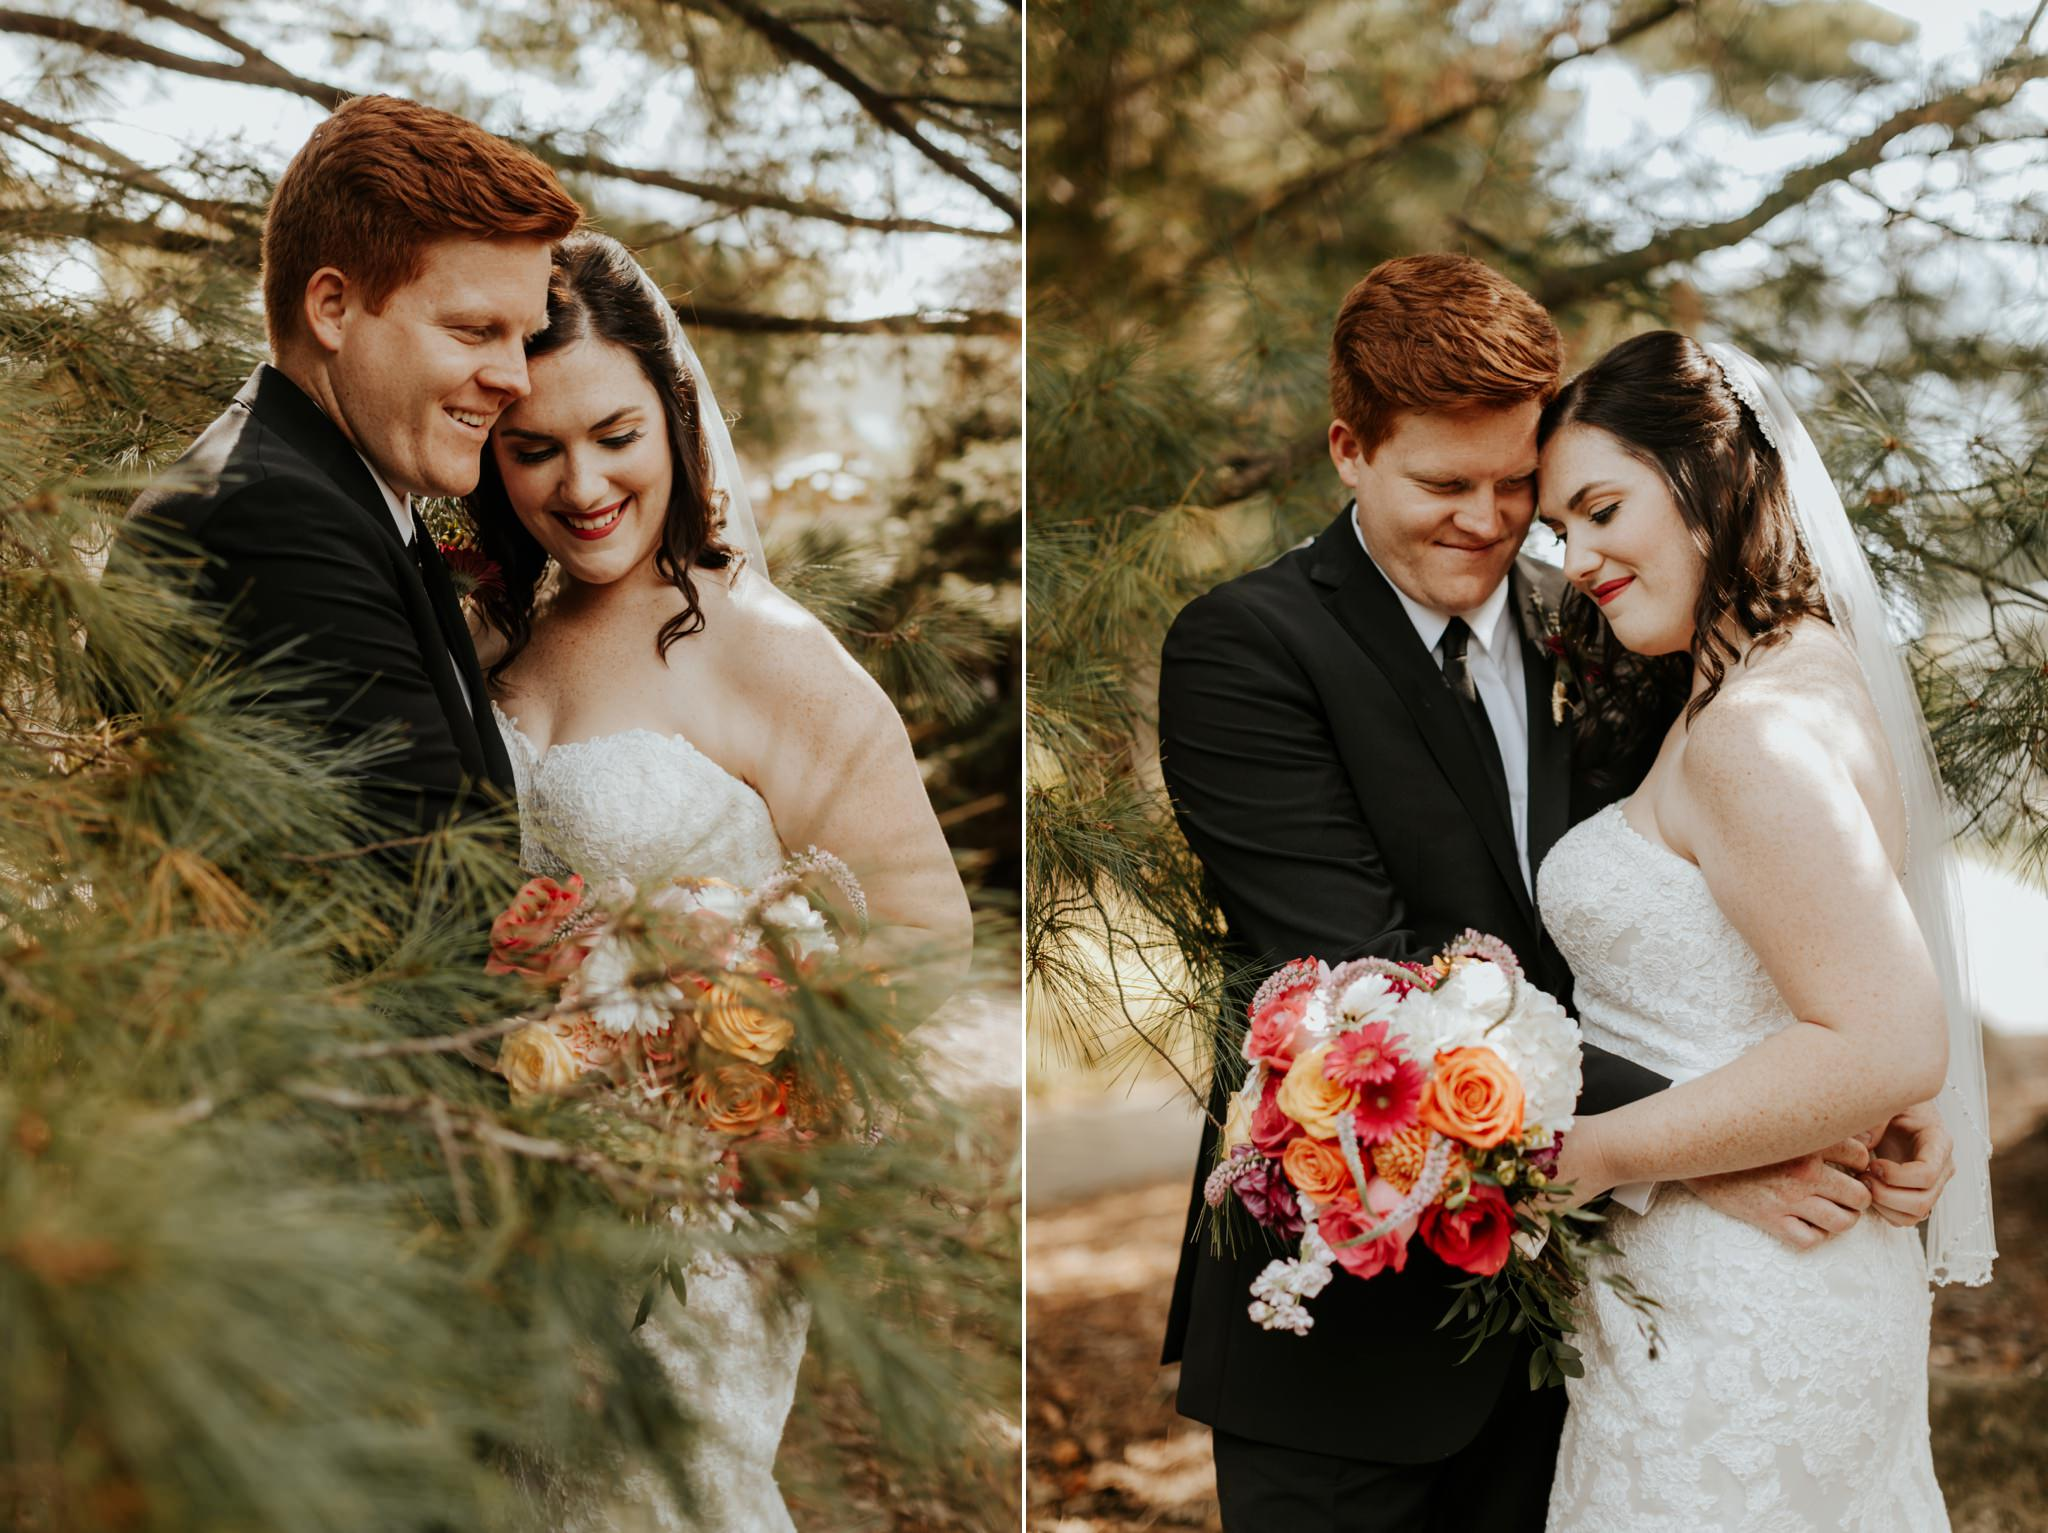 17-09-15 Lindsey and Brandon Wedding Edited-311_WEB.jpg